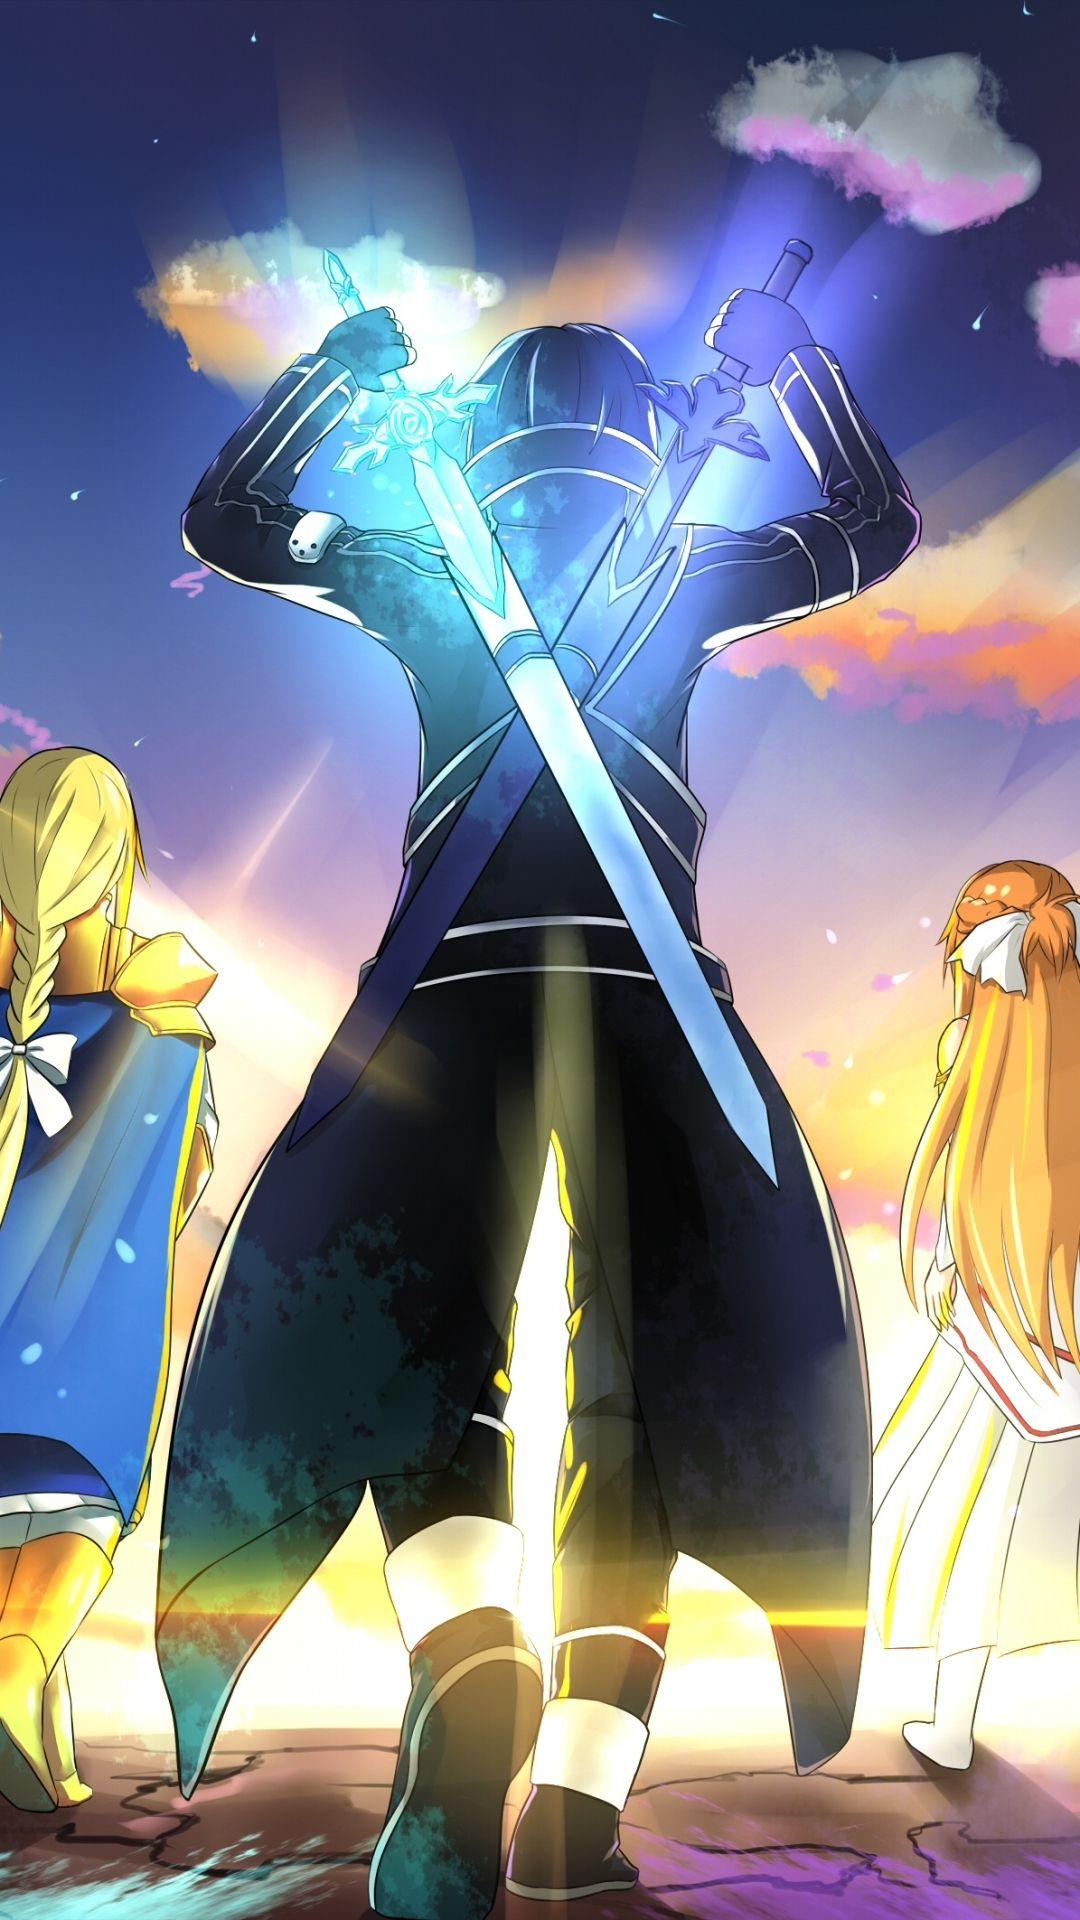 Wallpaper Anime Sword Art Online Alicization Kirito Sword Art